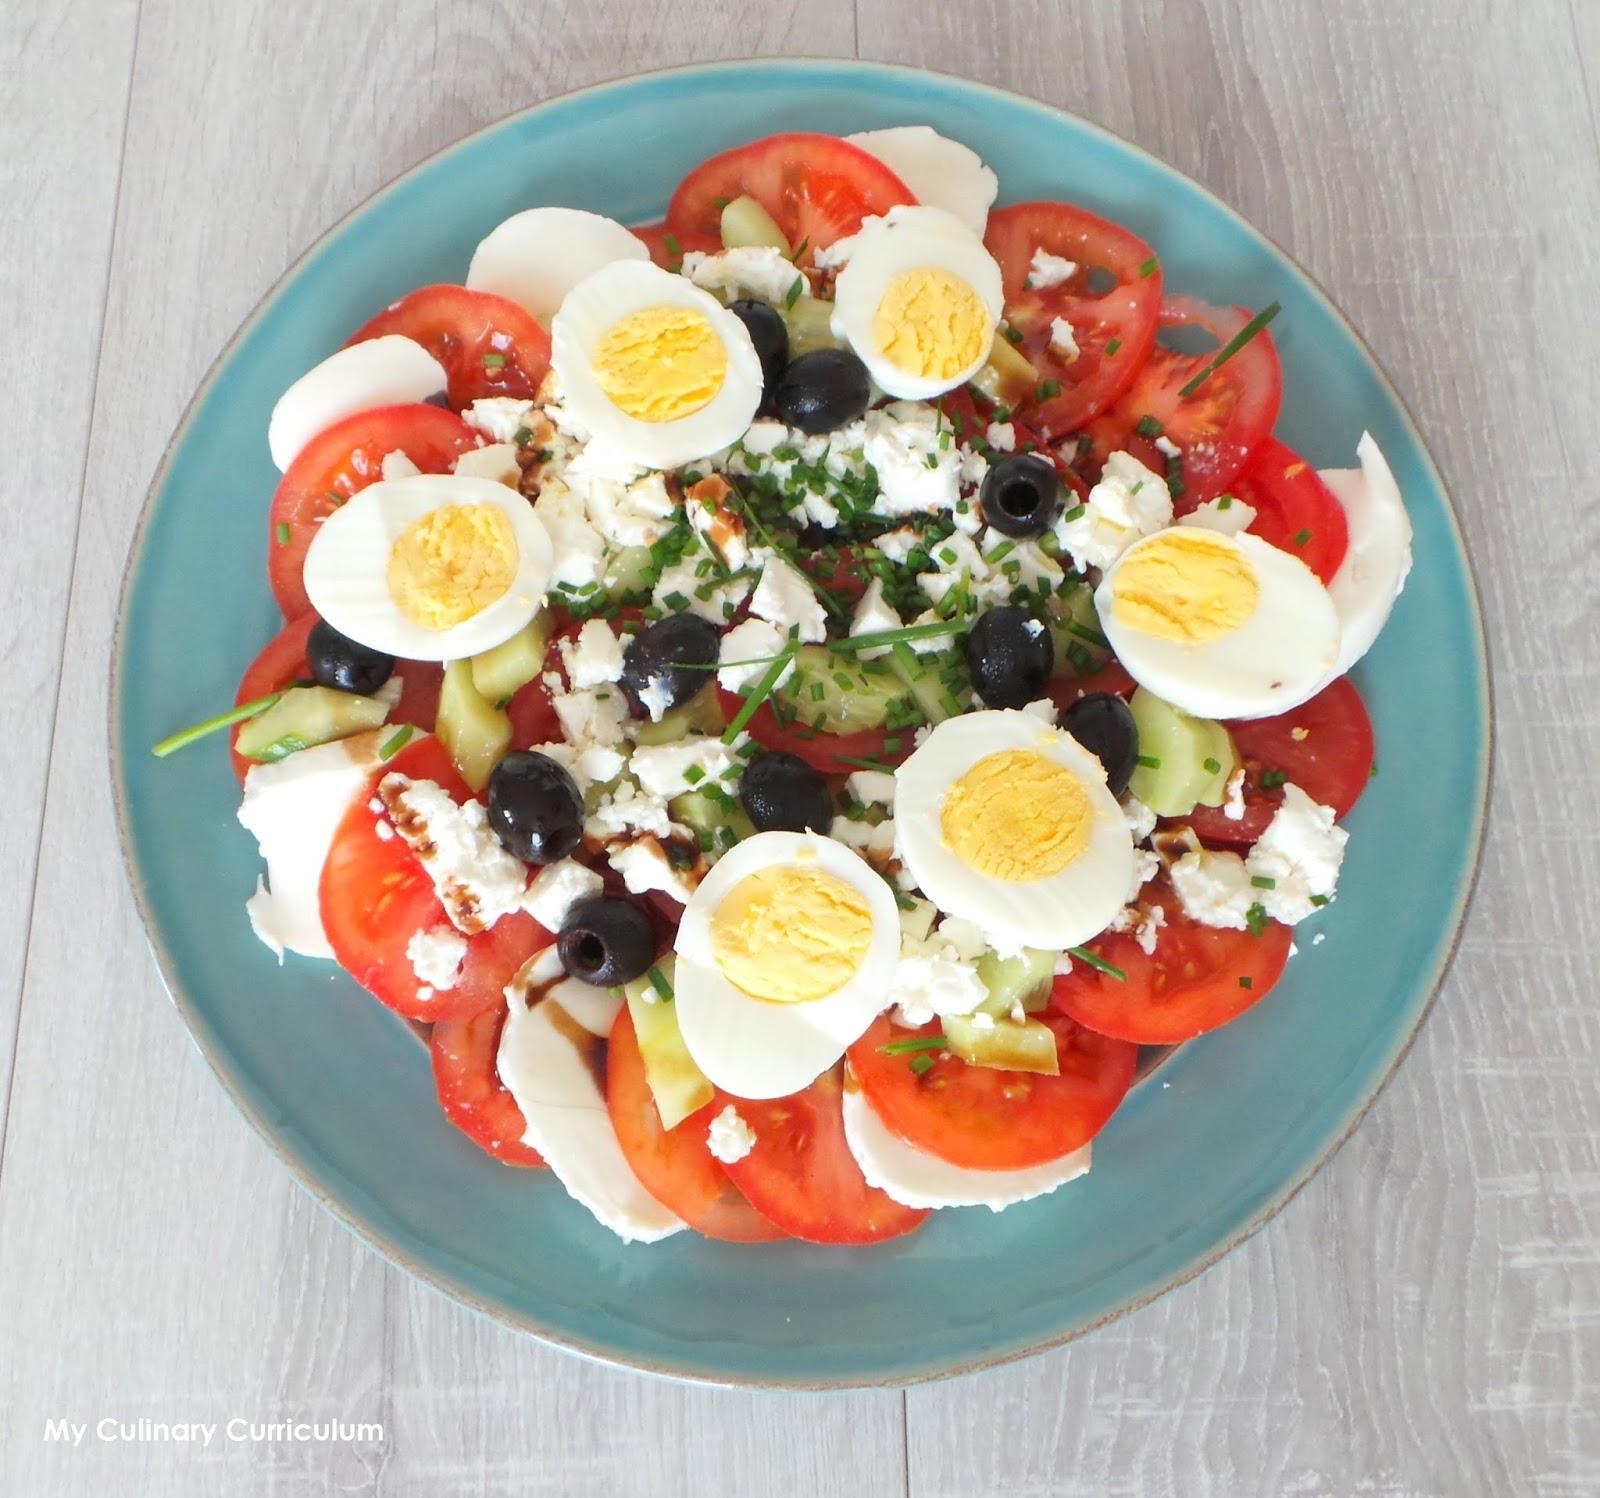 Salade compose simple good recette de cuisine salade pimontaise with salade compose simple - Salade de tomates simple ...